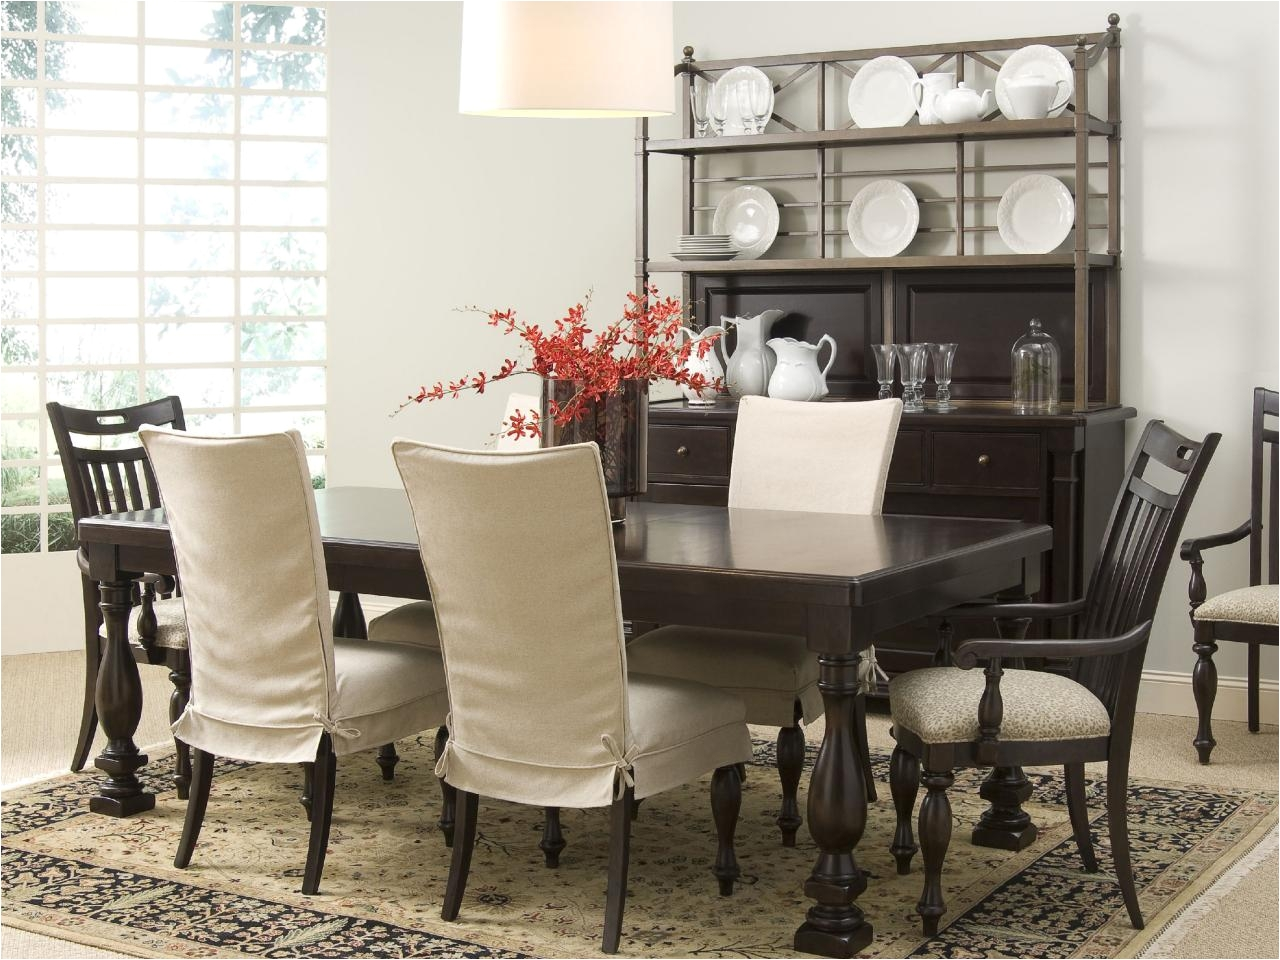 White Linen Parson Chair Slipcovers Dining Room Slipcover Maribo Intelligentsolutions Co